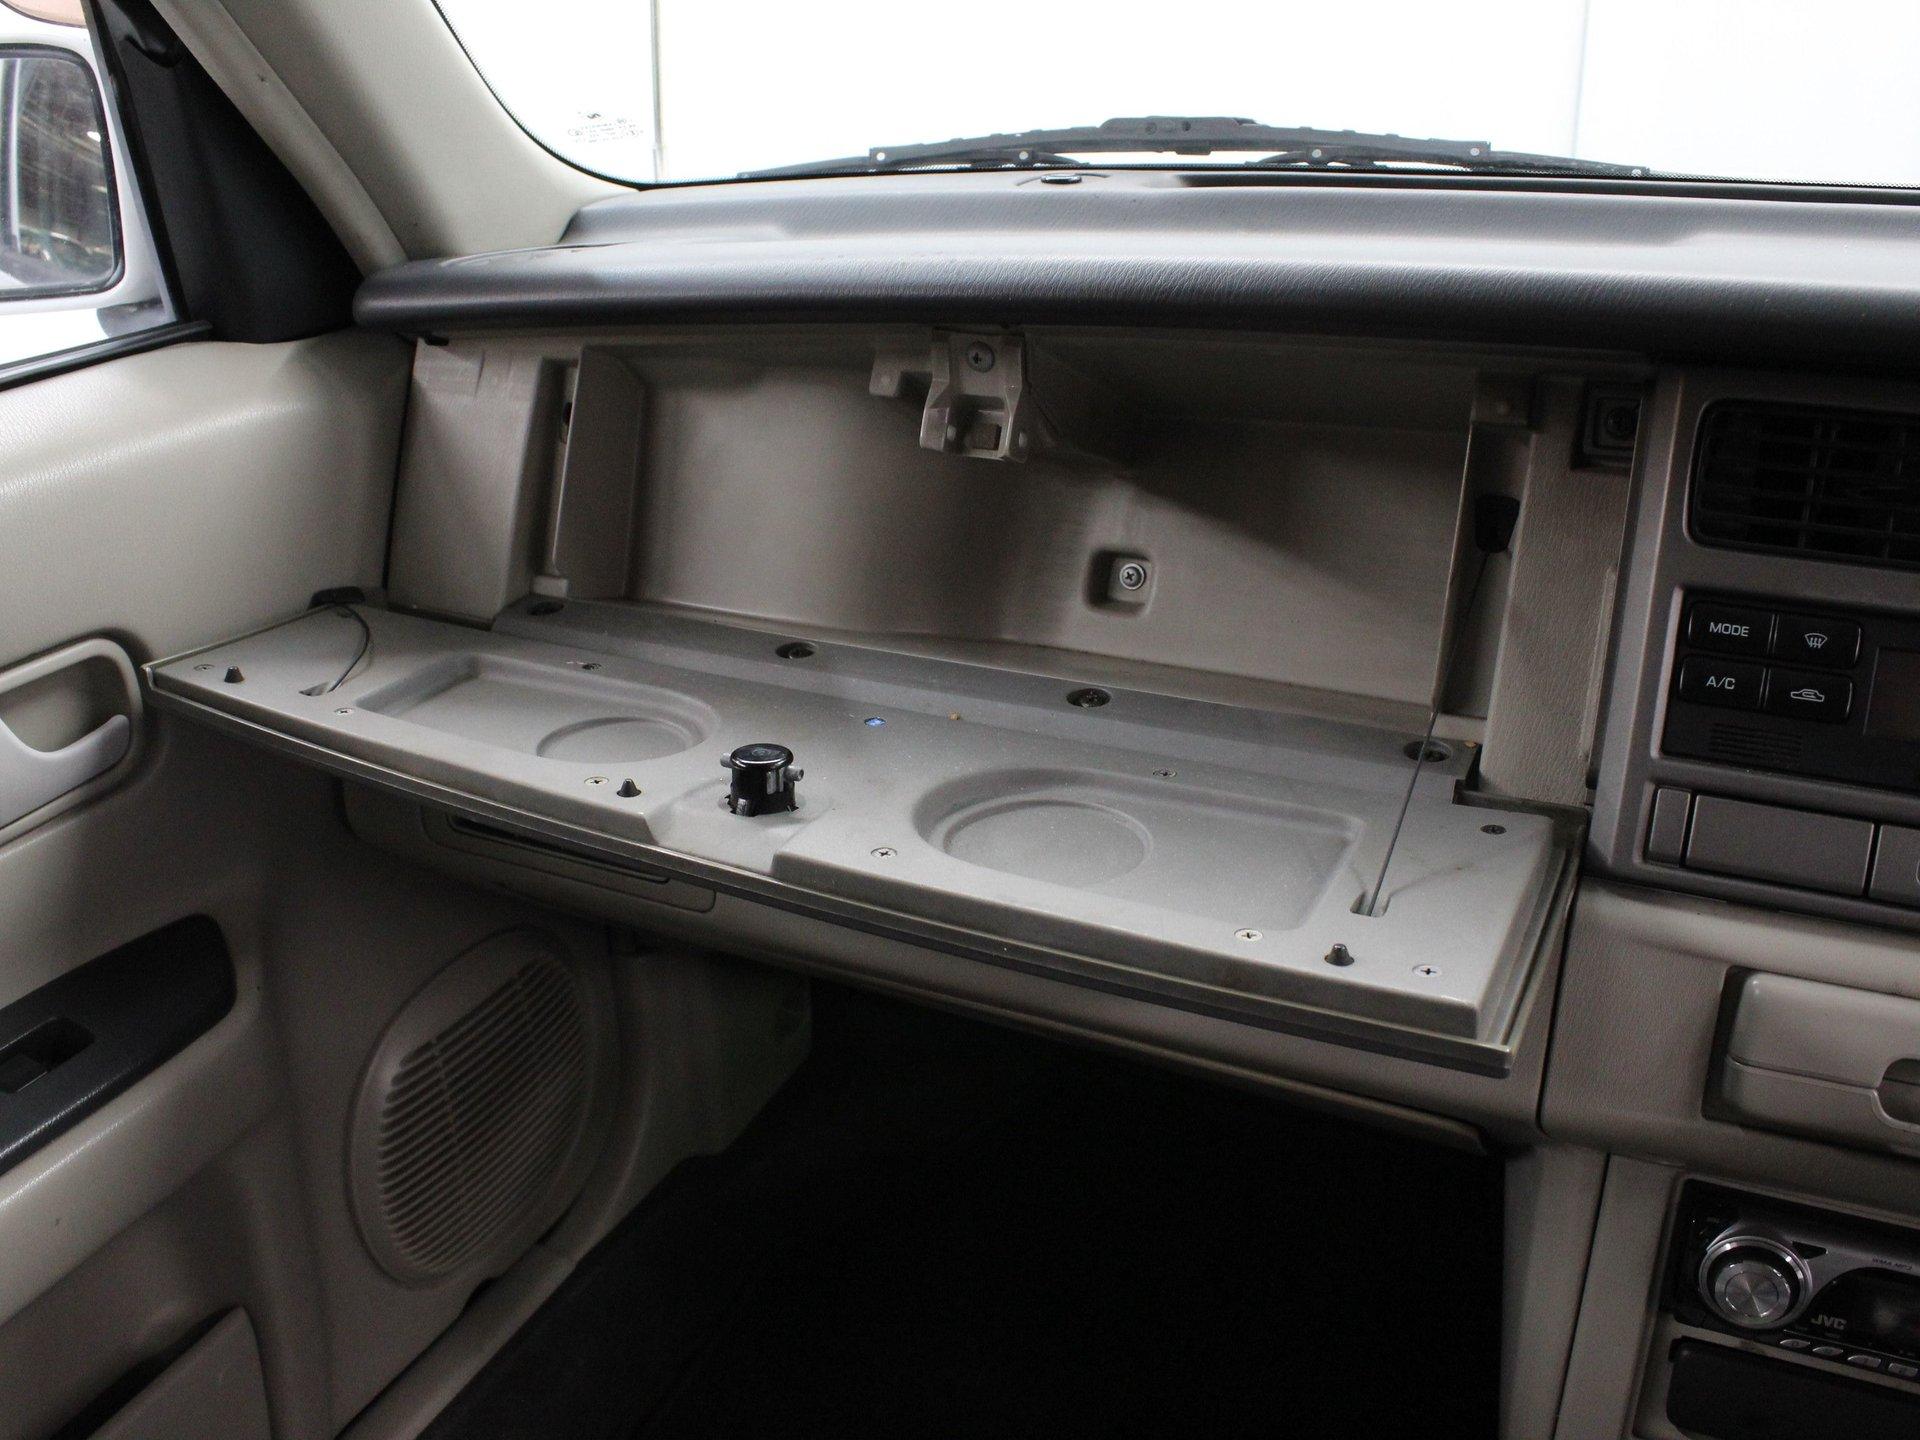 1991 Nissan Rasheen